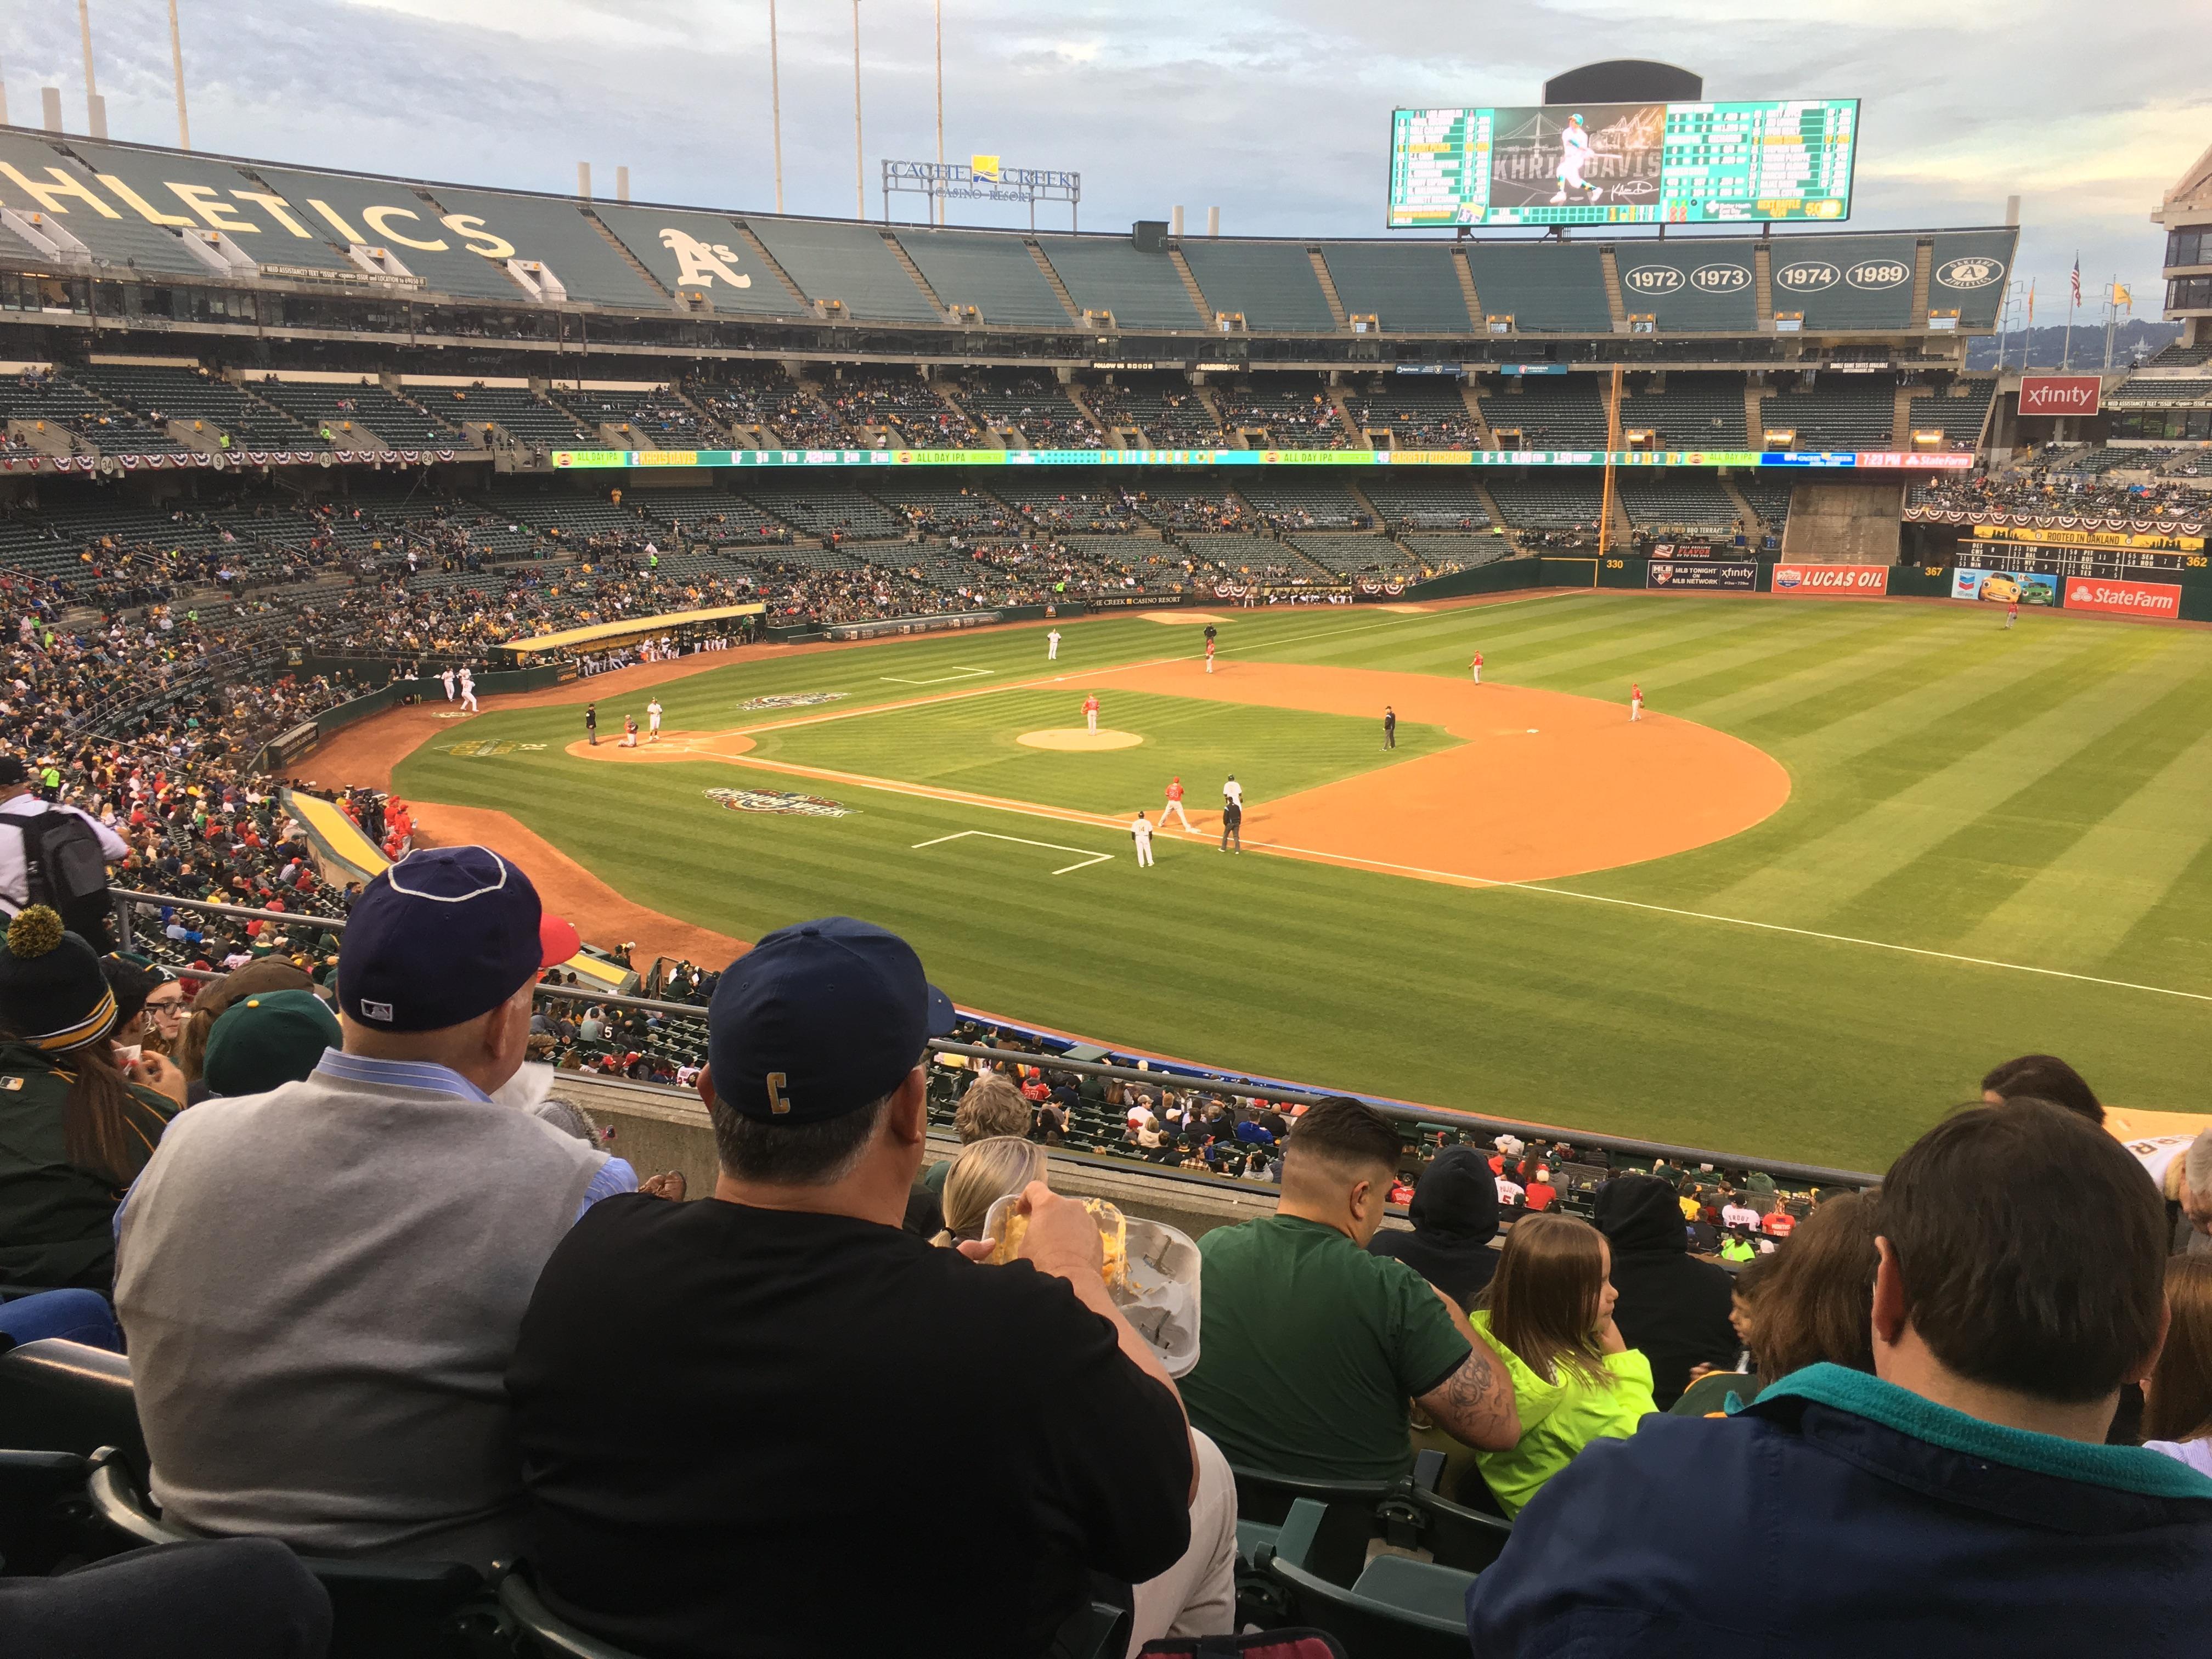 Oakland Coliseum Section 209 Row 7 Seat 3